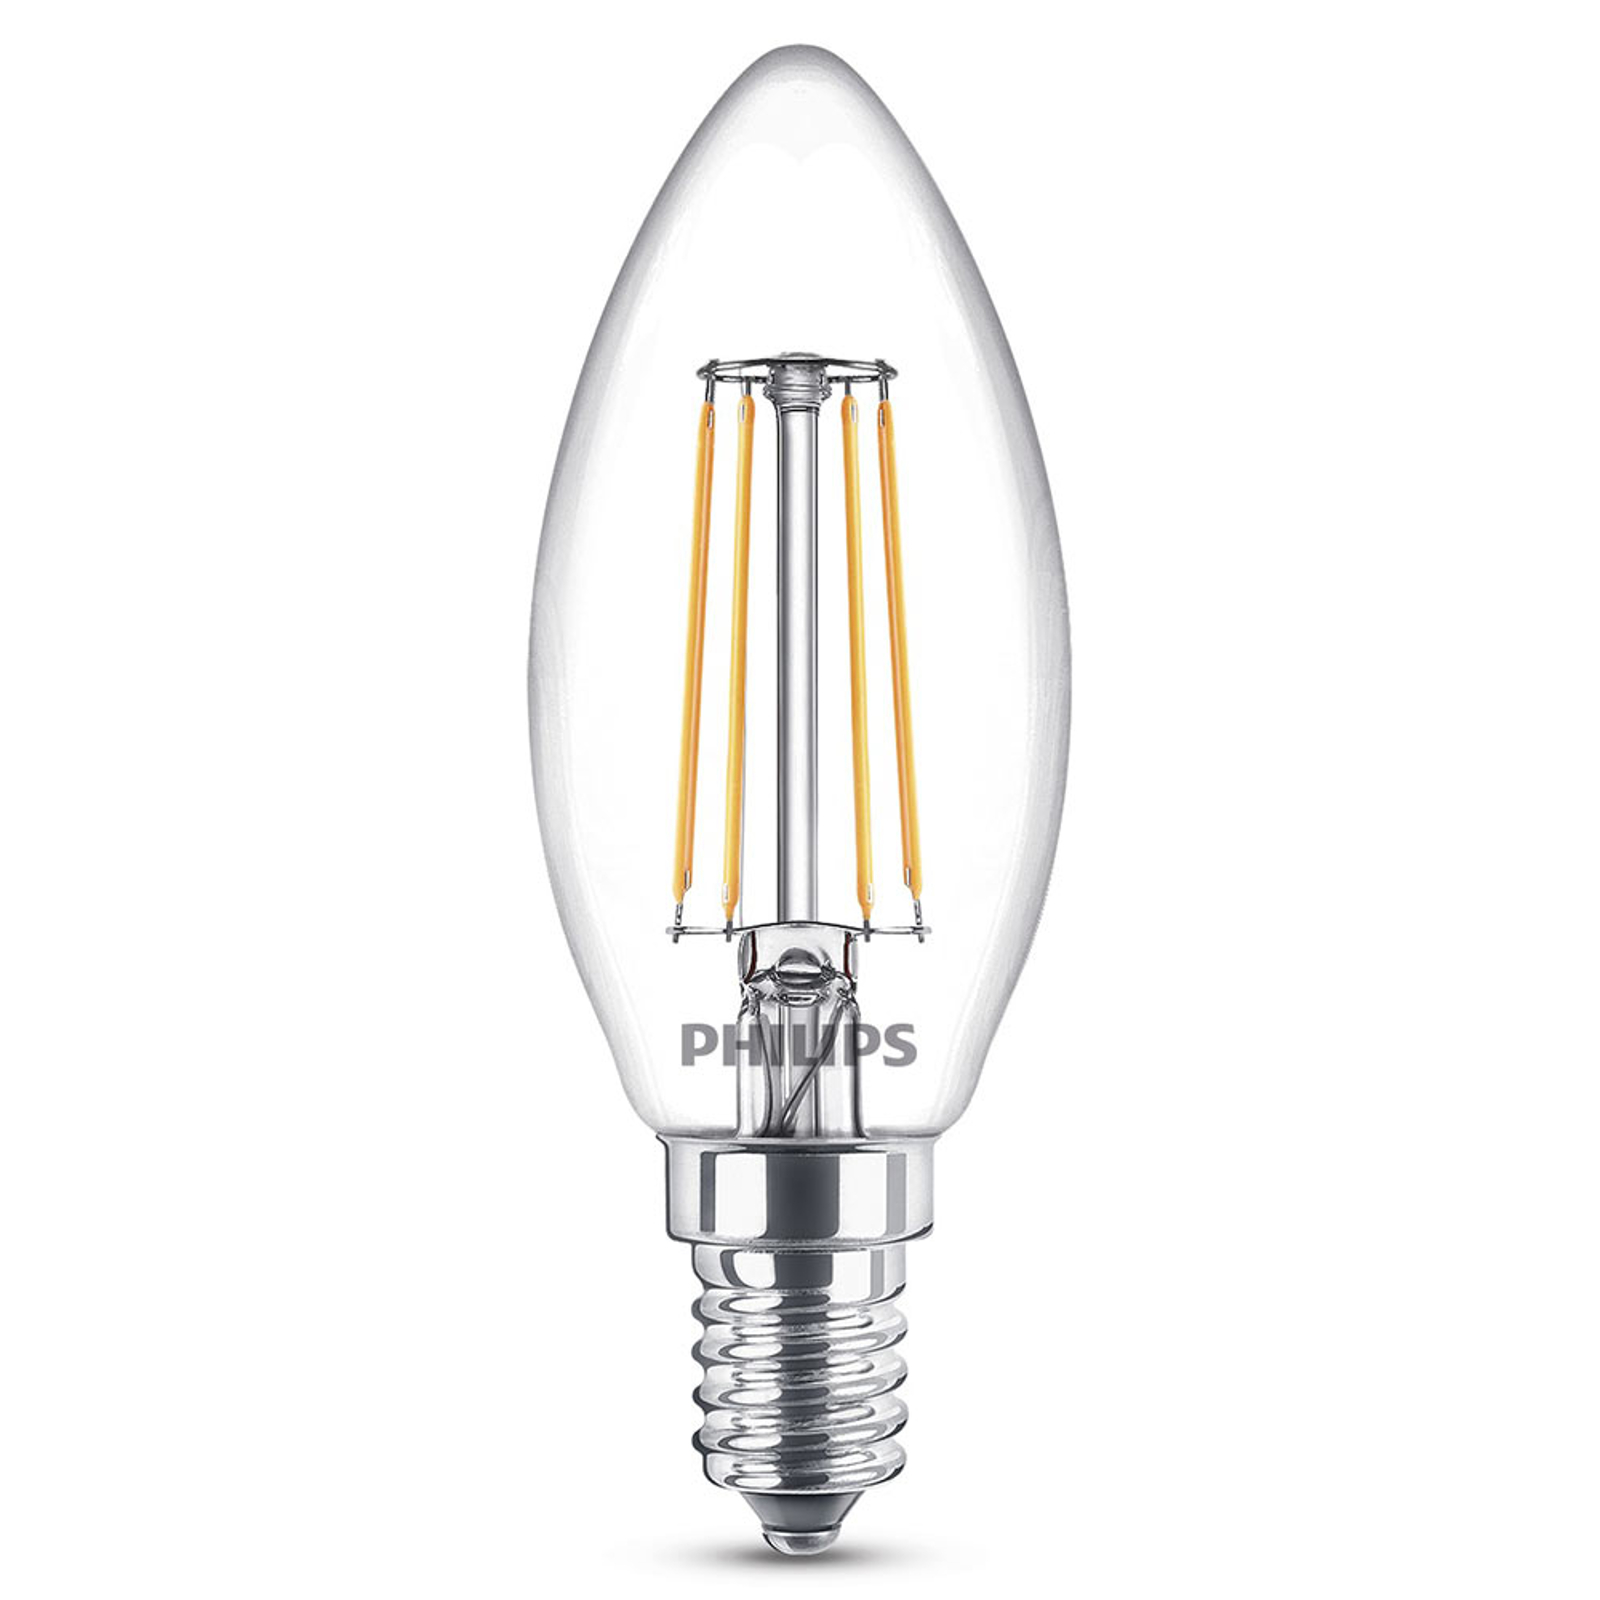 Philips E14 LED-Kerzenlampe 4,3W warmweiß Filament